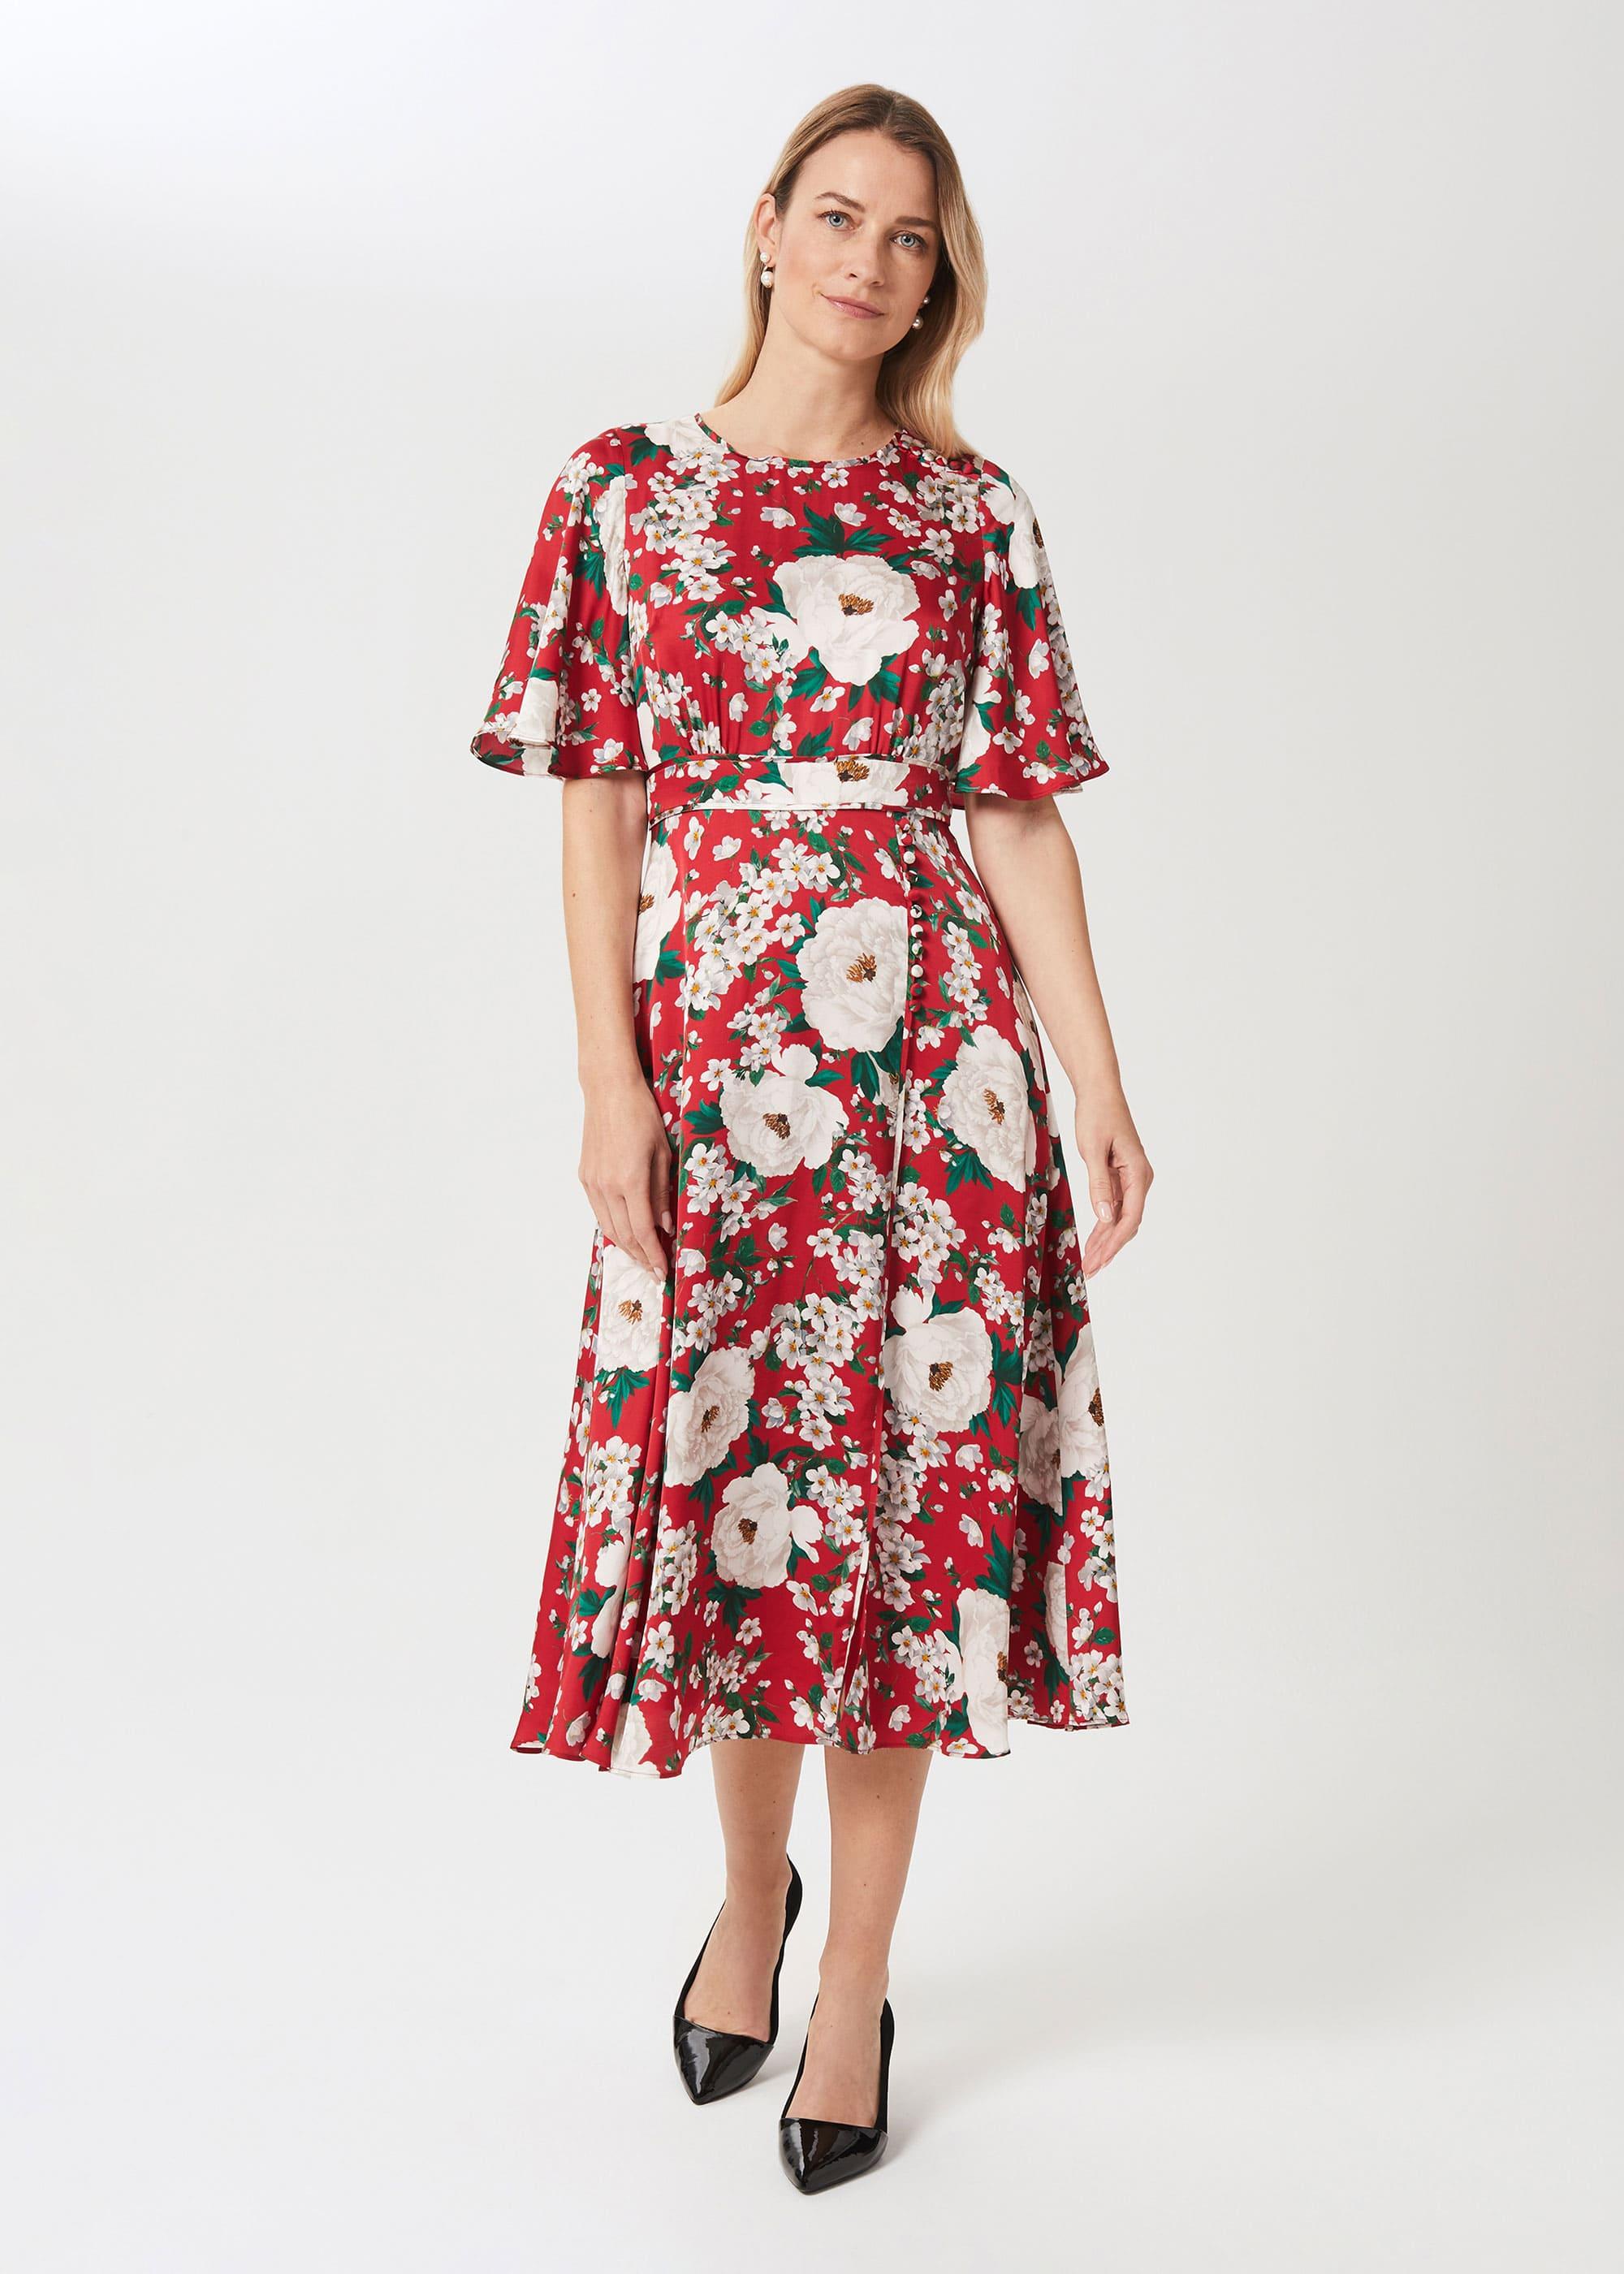 Hobbs Women Bella Floral Print Satin Dress